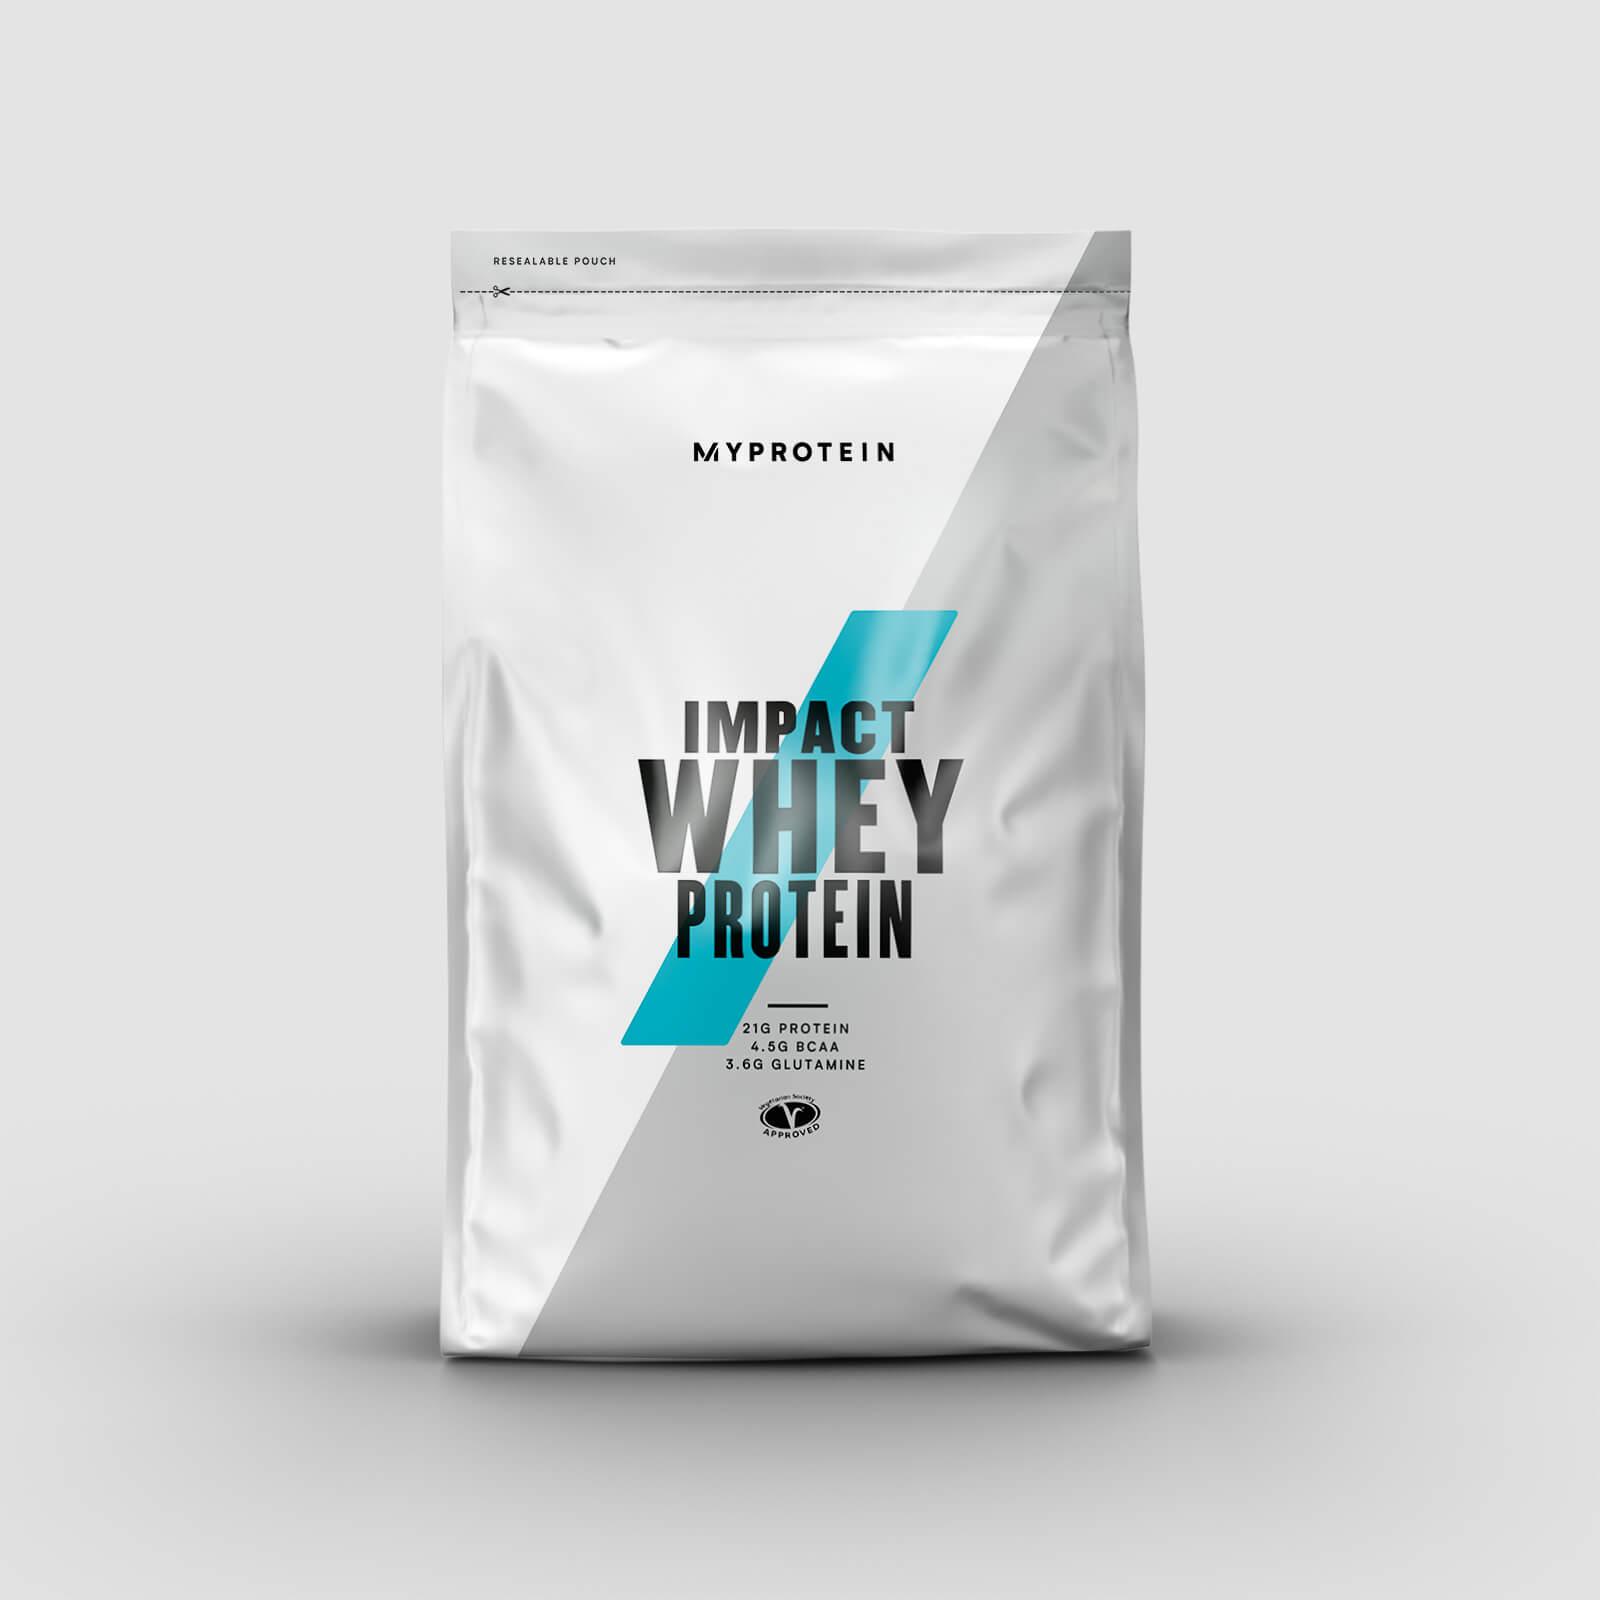 Myprotein Impact Whey Protein - 2.5kg - Gateau au fromage Myrtille